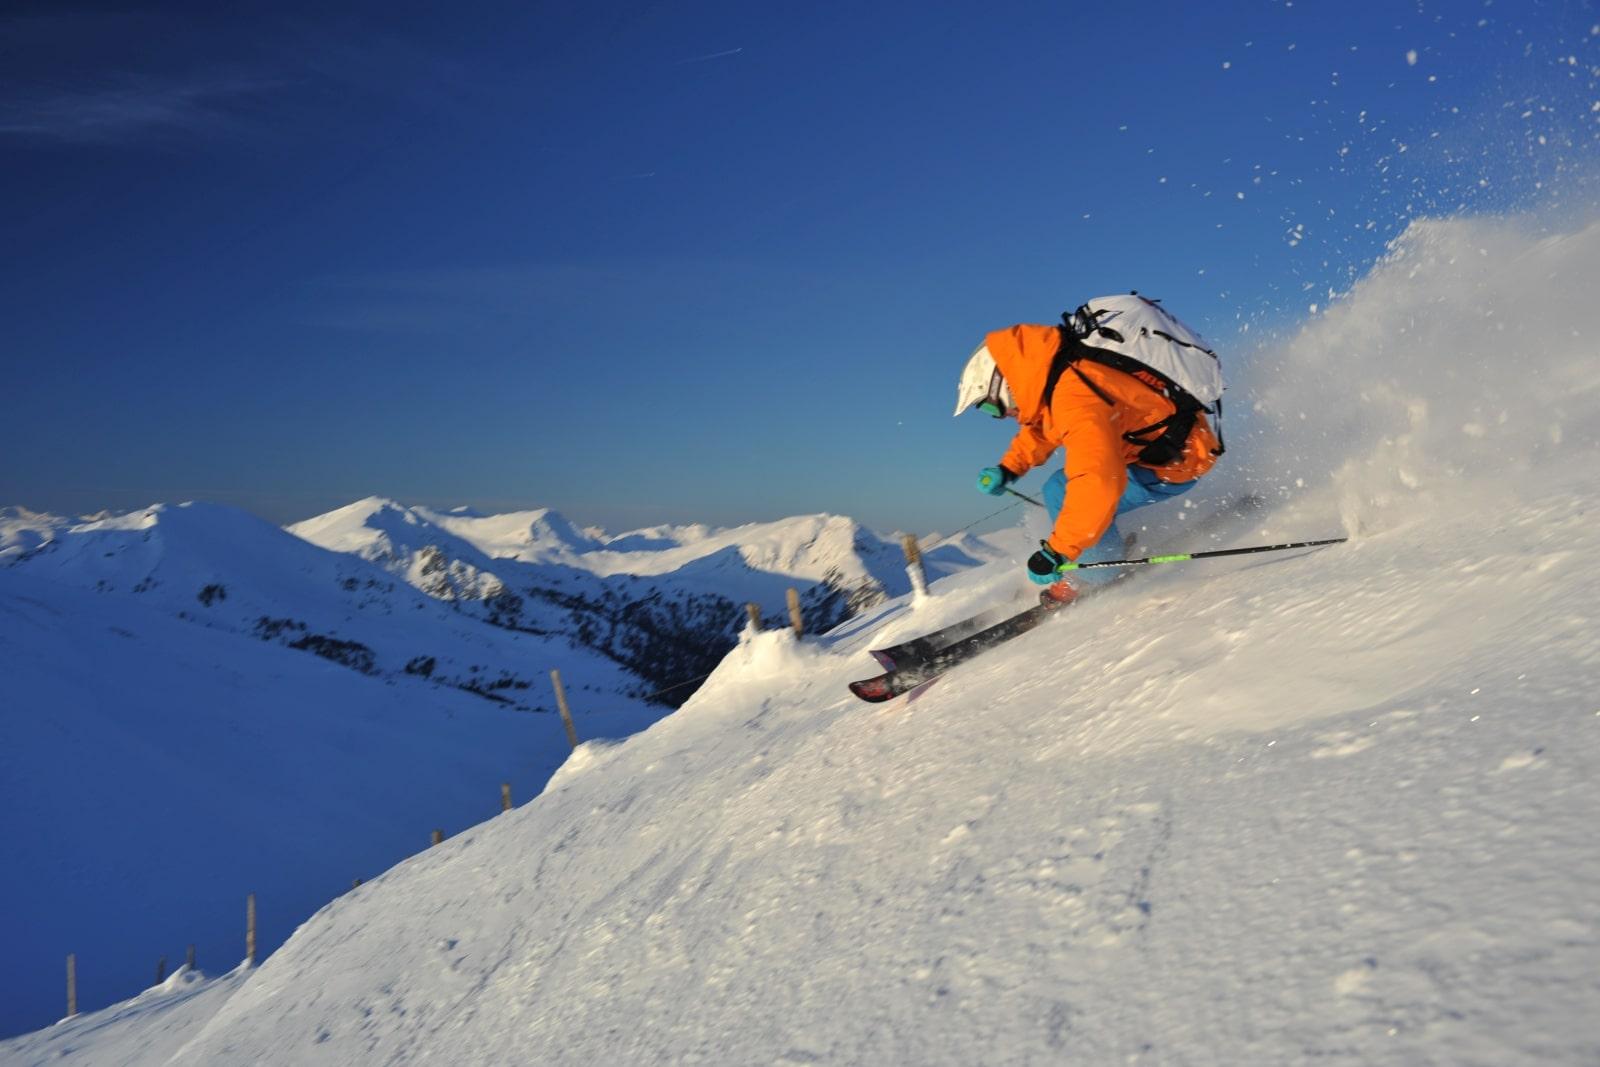 Heidi-Chalet-Falkert-Heidialm-Falkertsee-Ski-Nockberge-Abfahrt